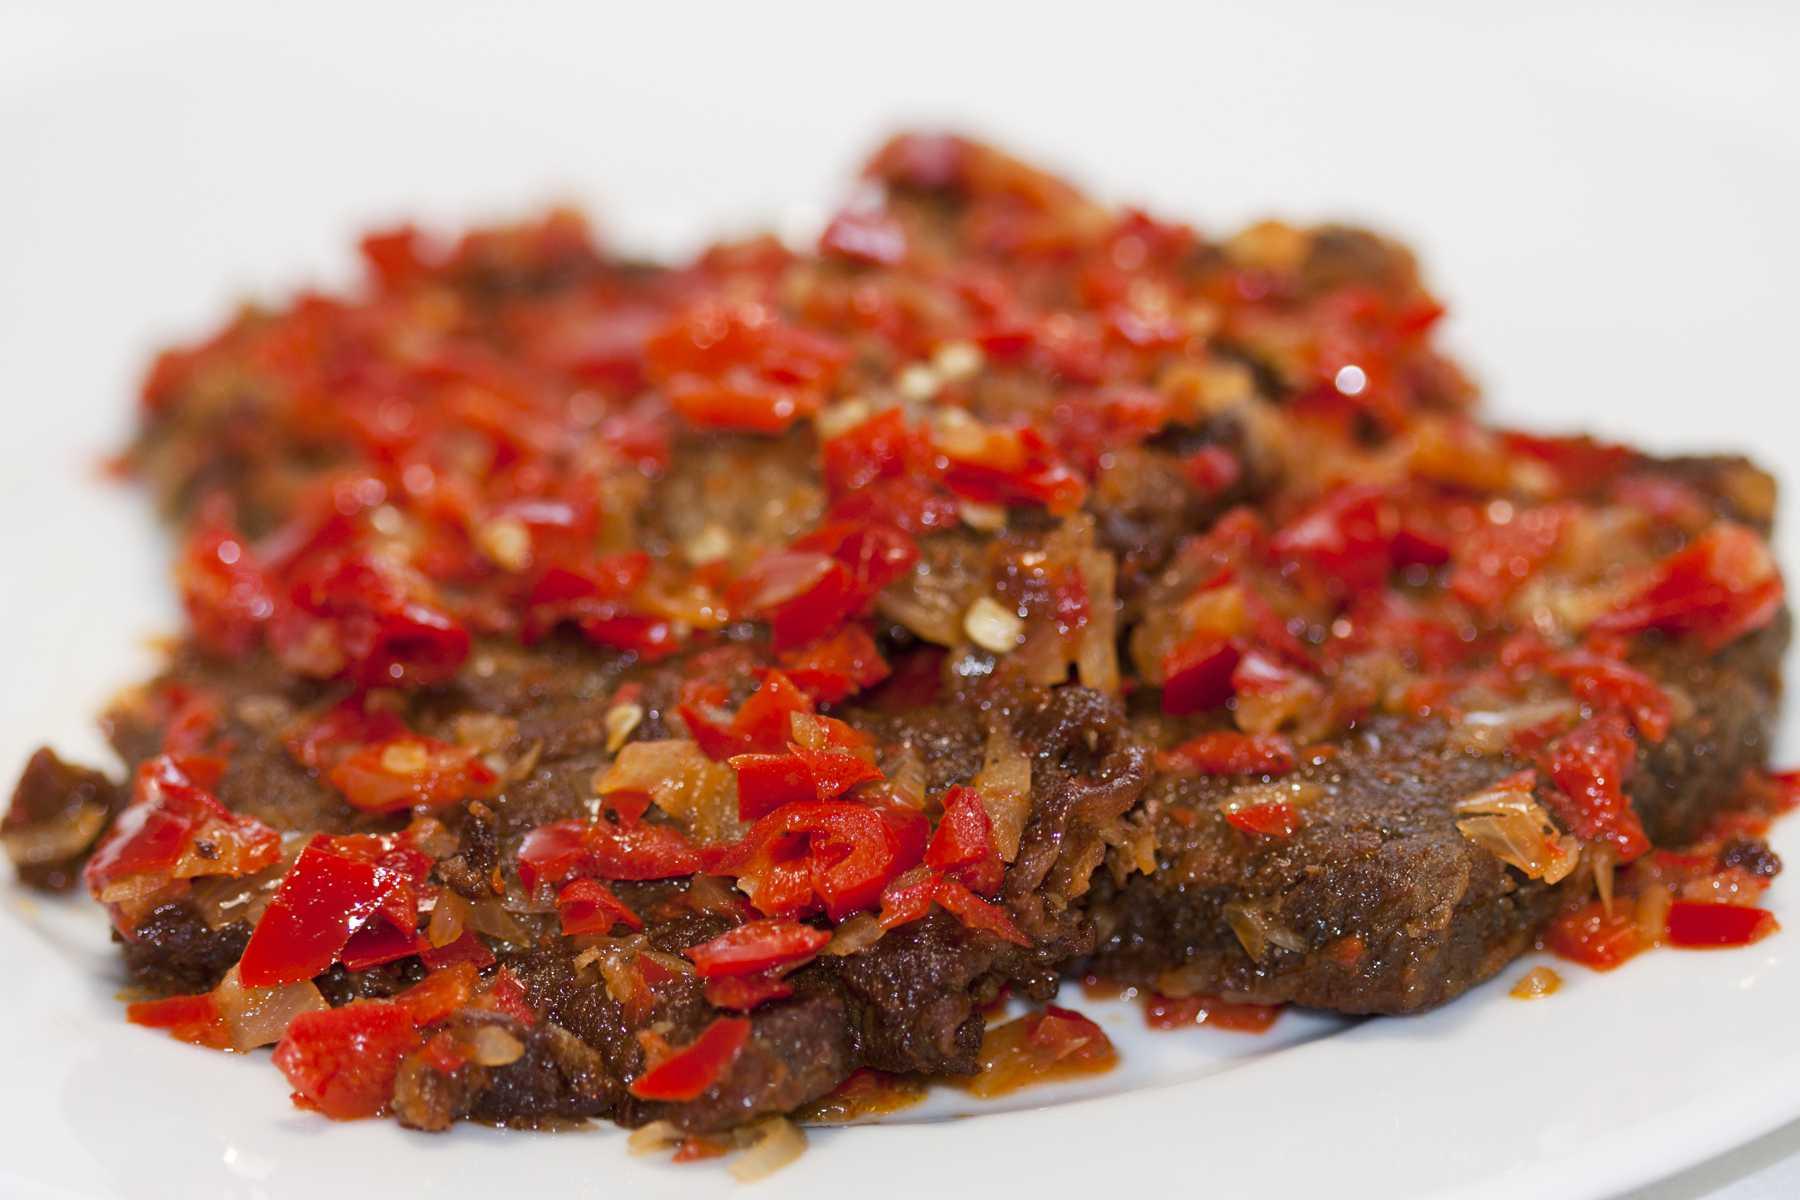 Resep Dendeng Batokok Khas Padang, Delicious